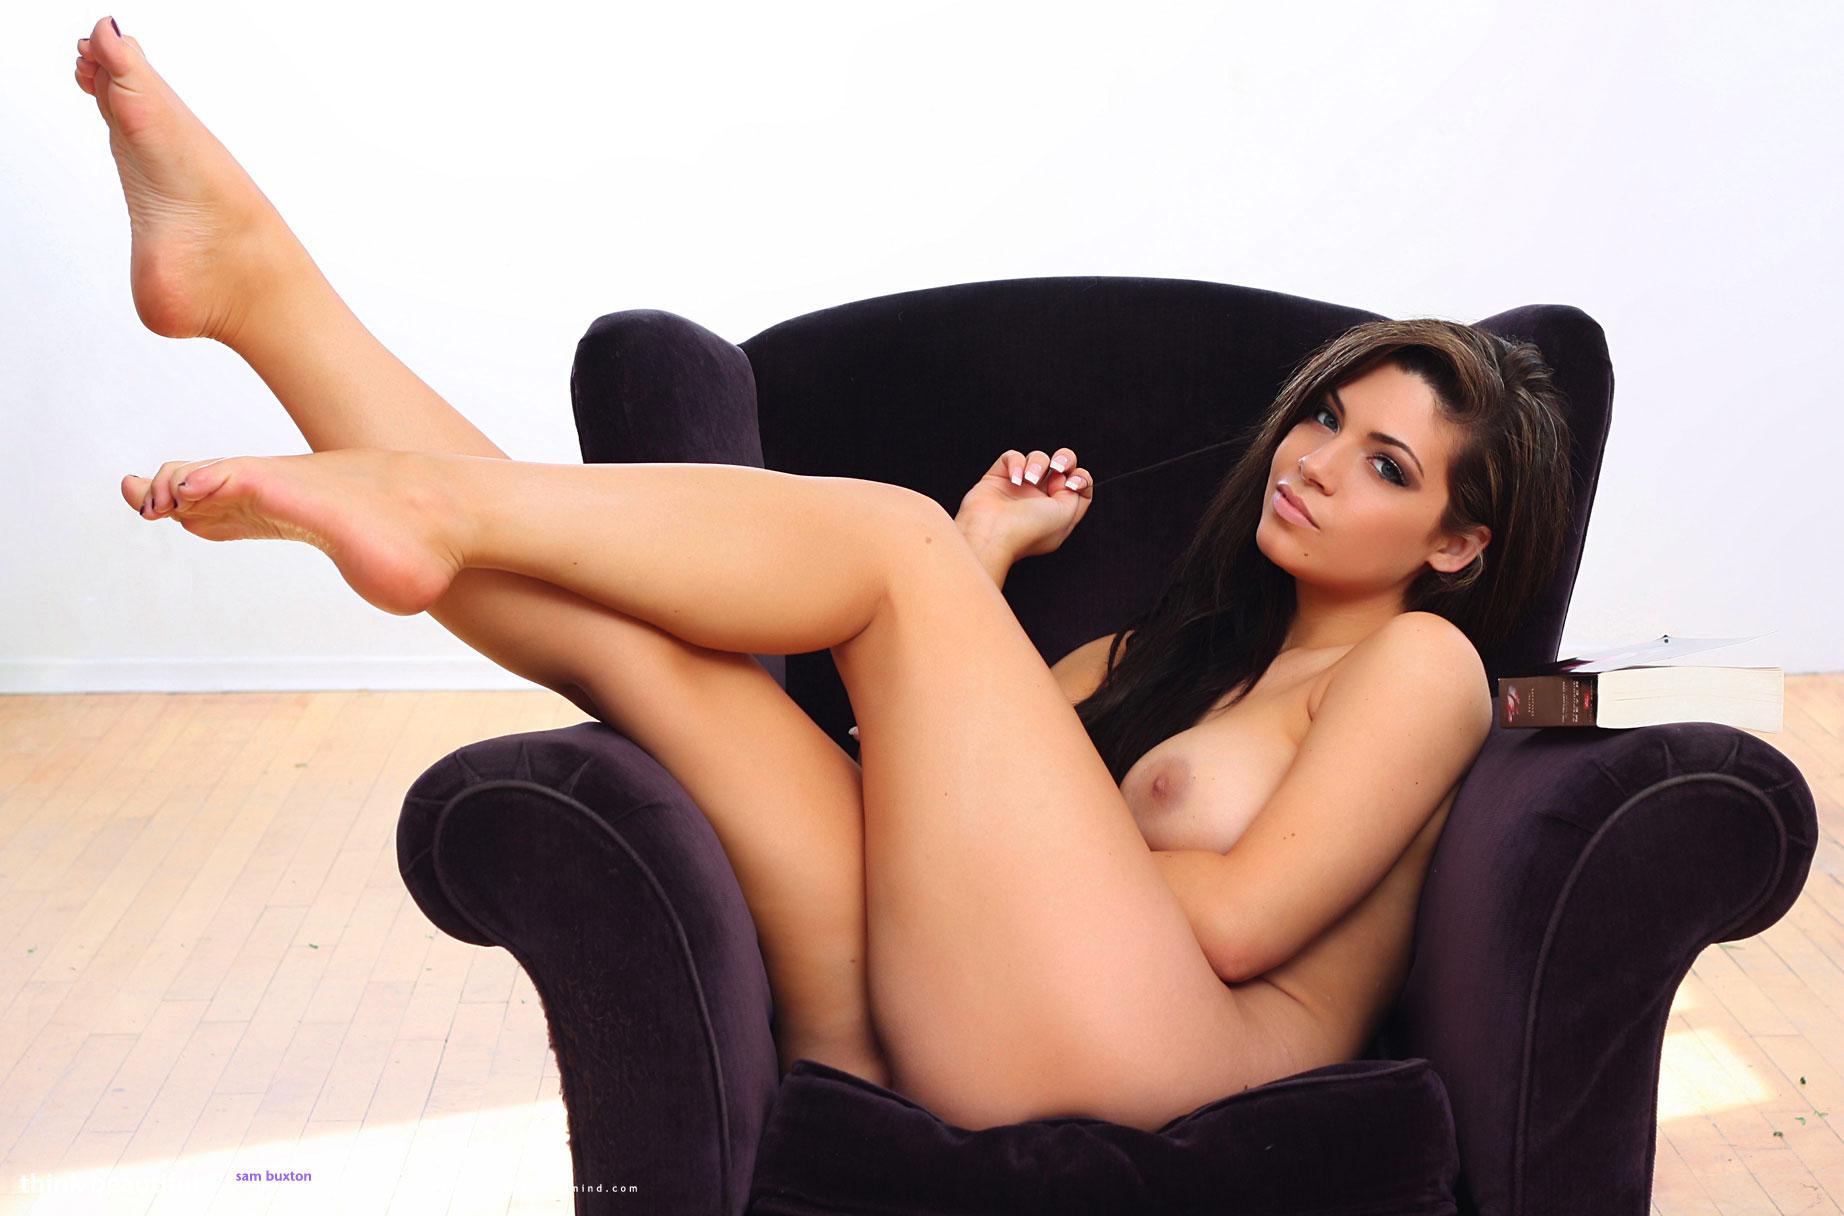 Fat girls naked eading galleries 293